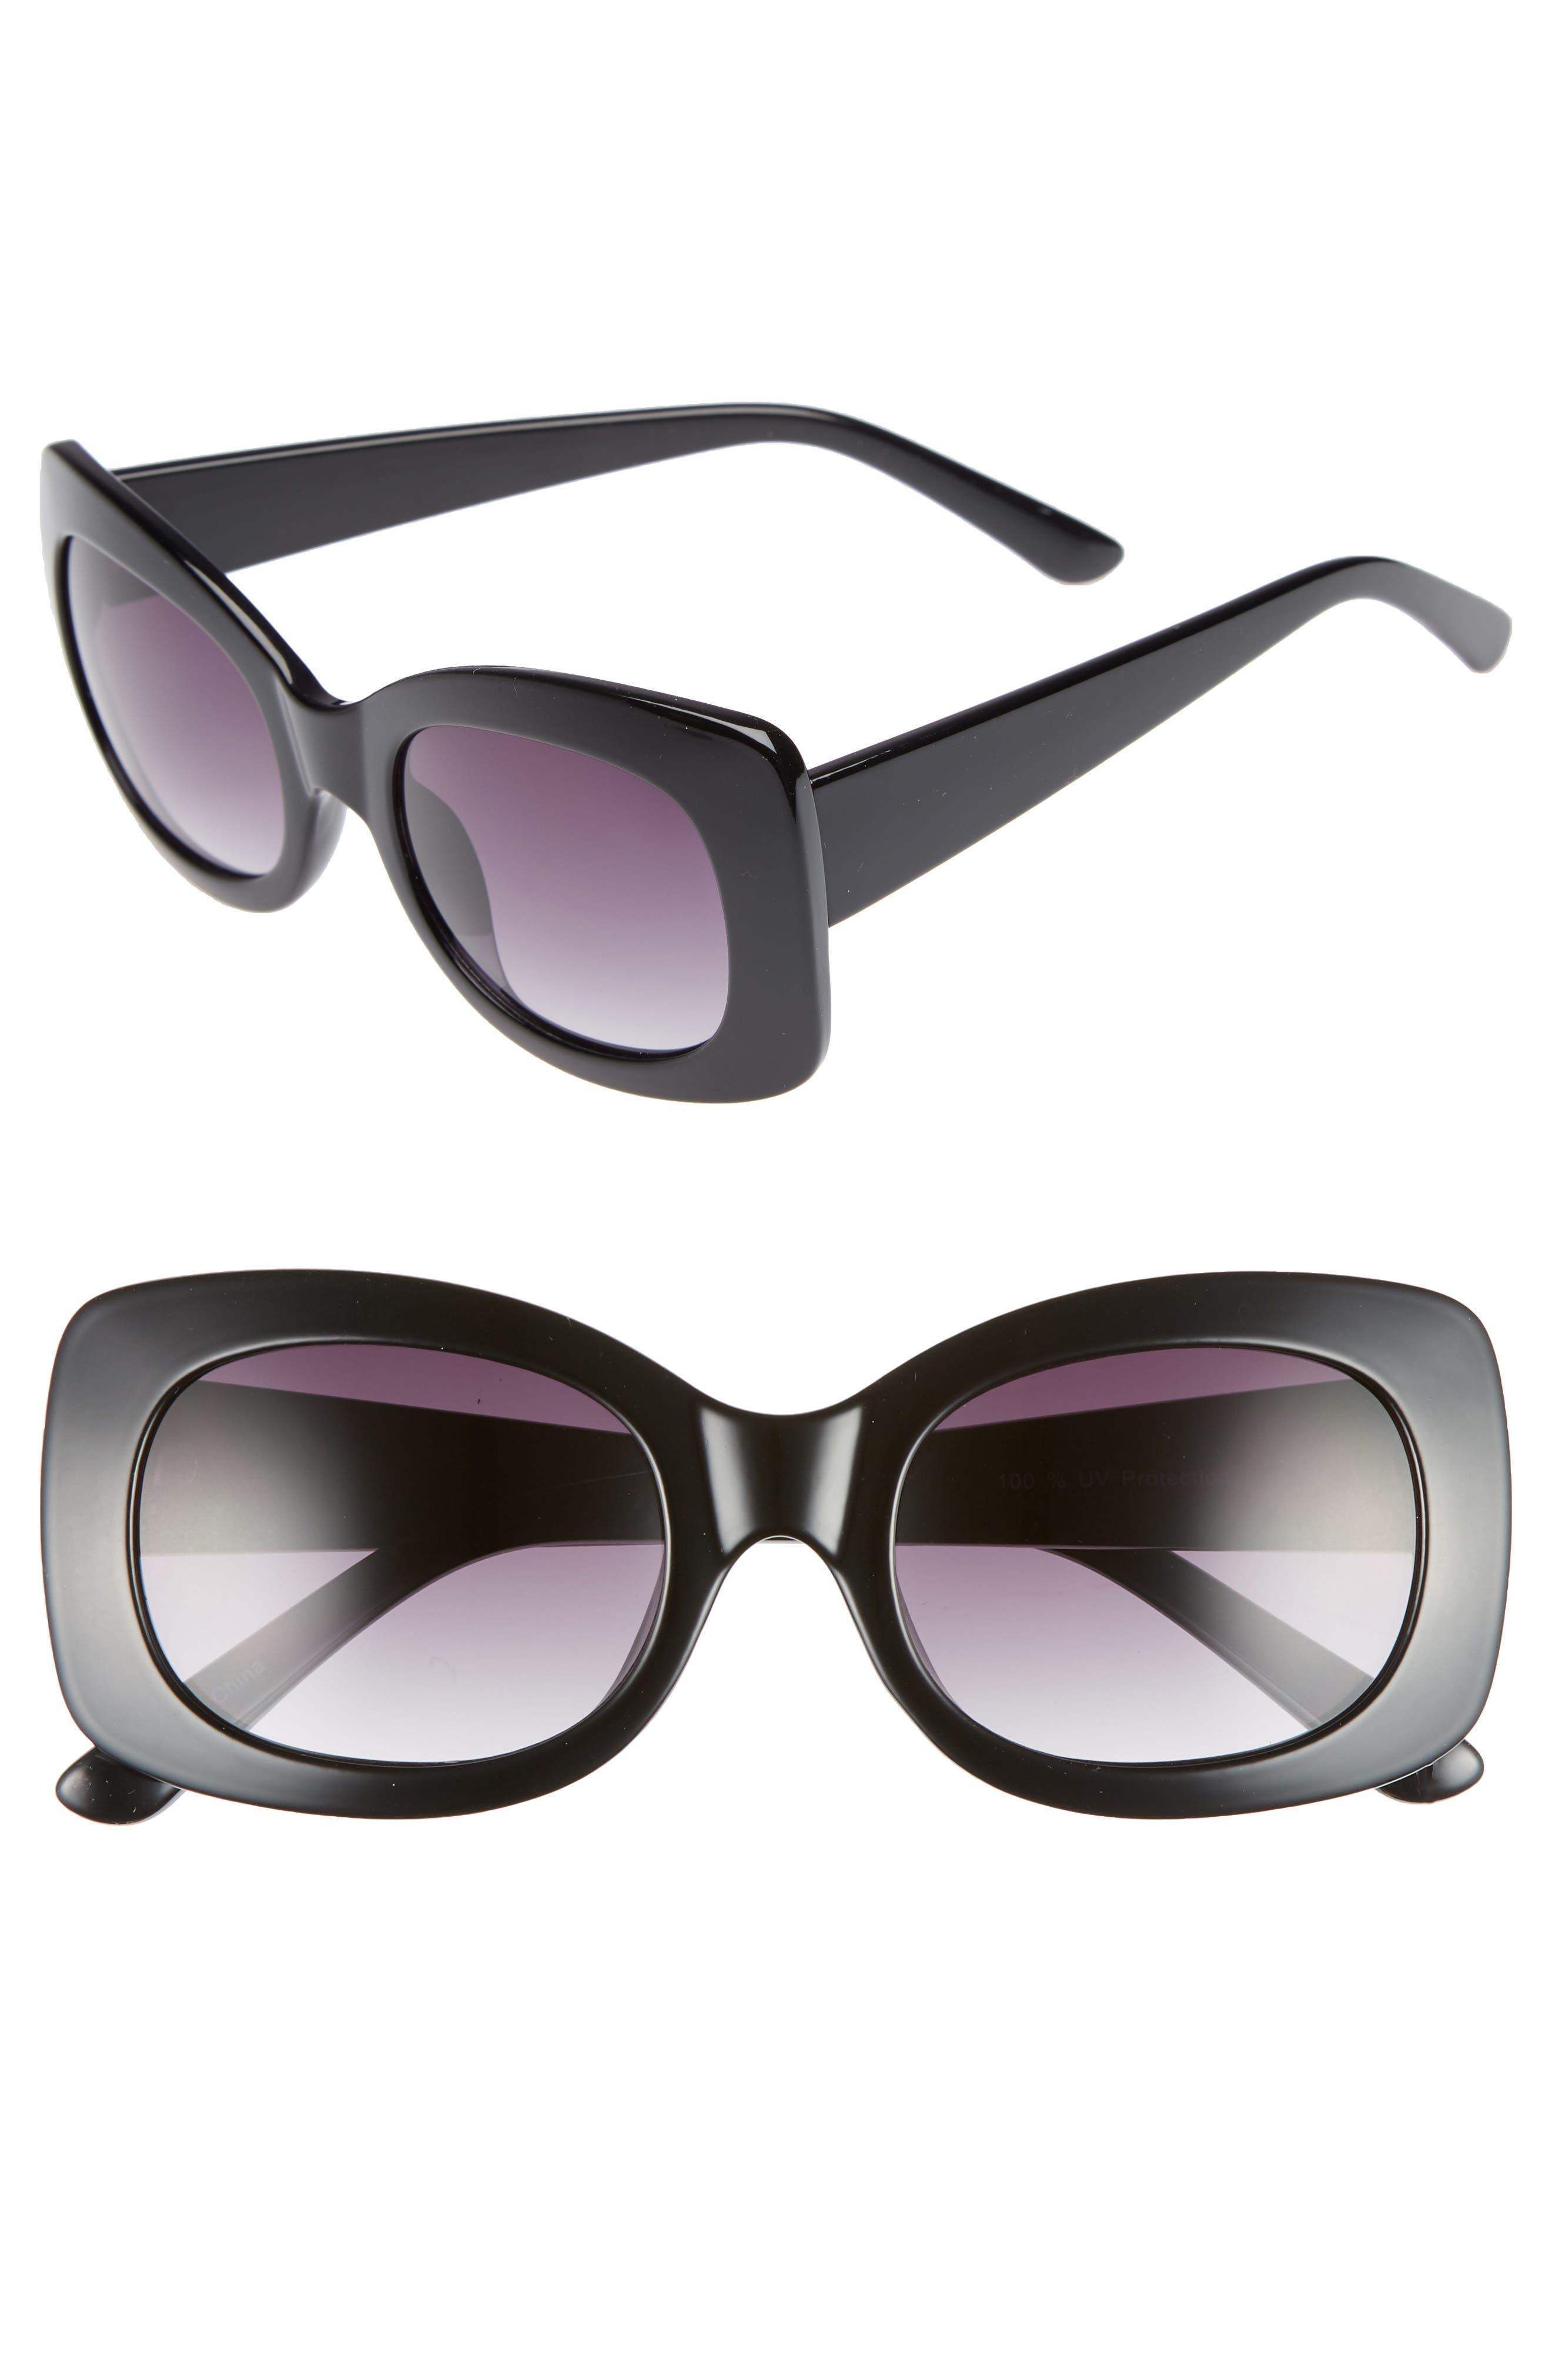 53mm Square Sunglasses,                             Main thumbnail 1, color,                             001